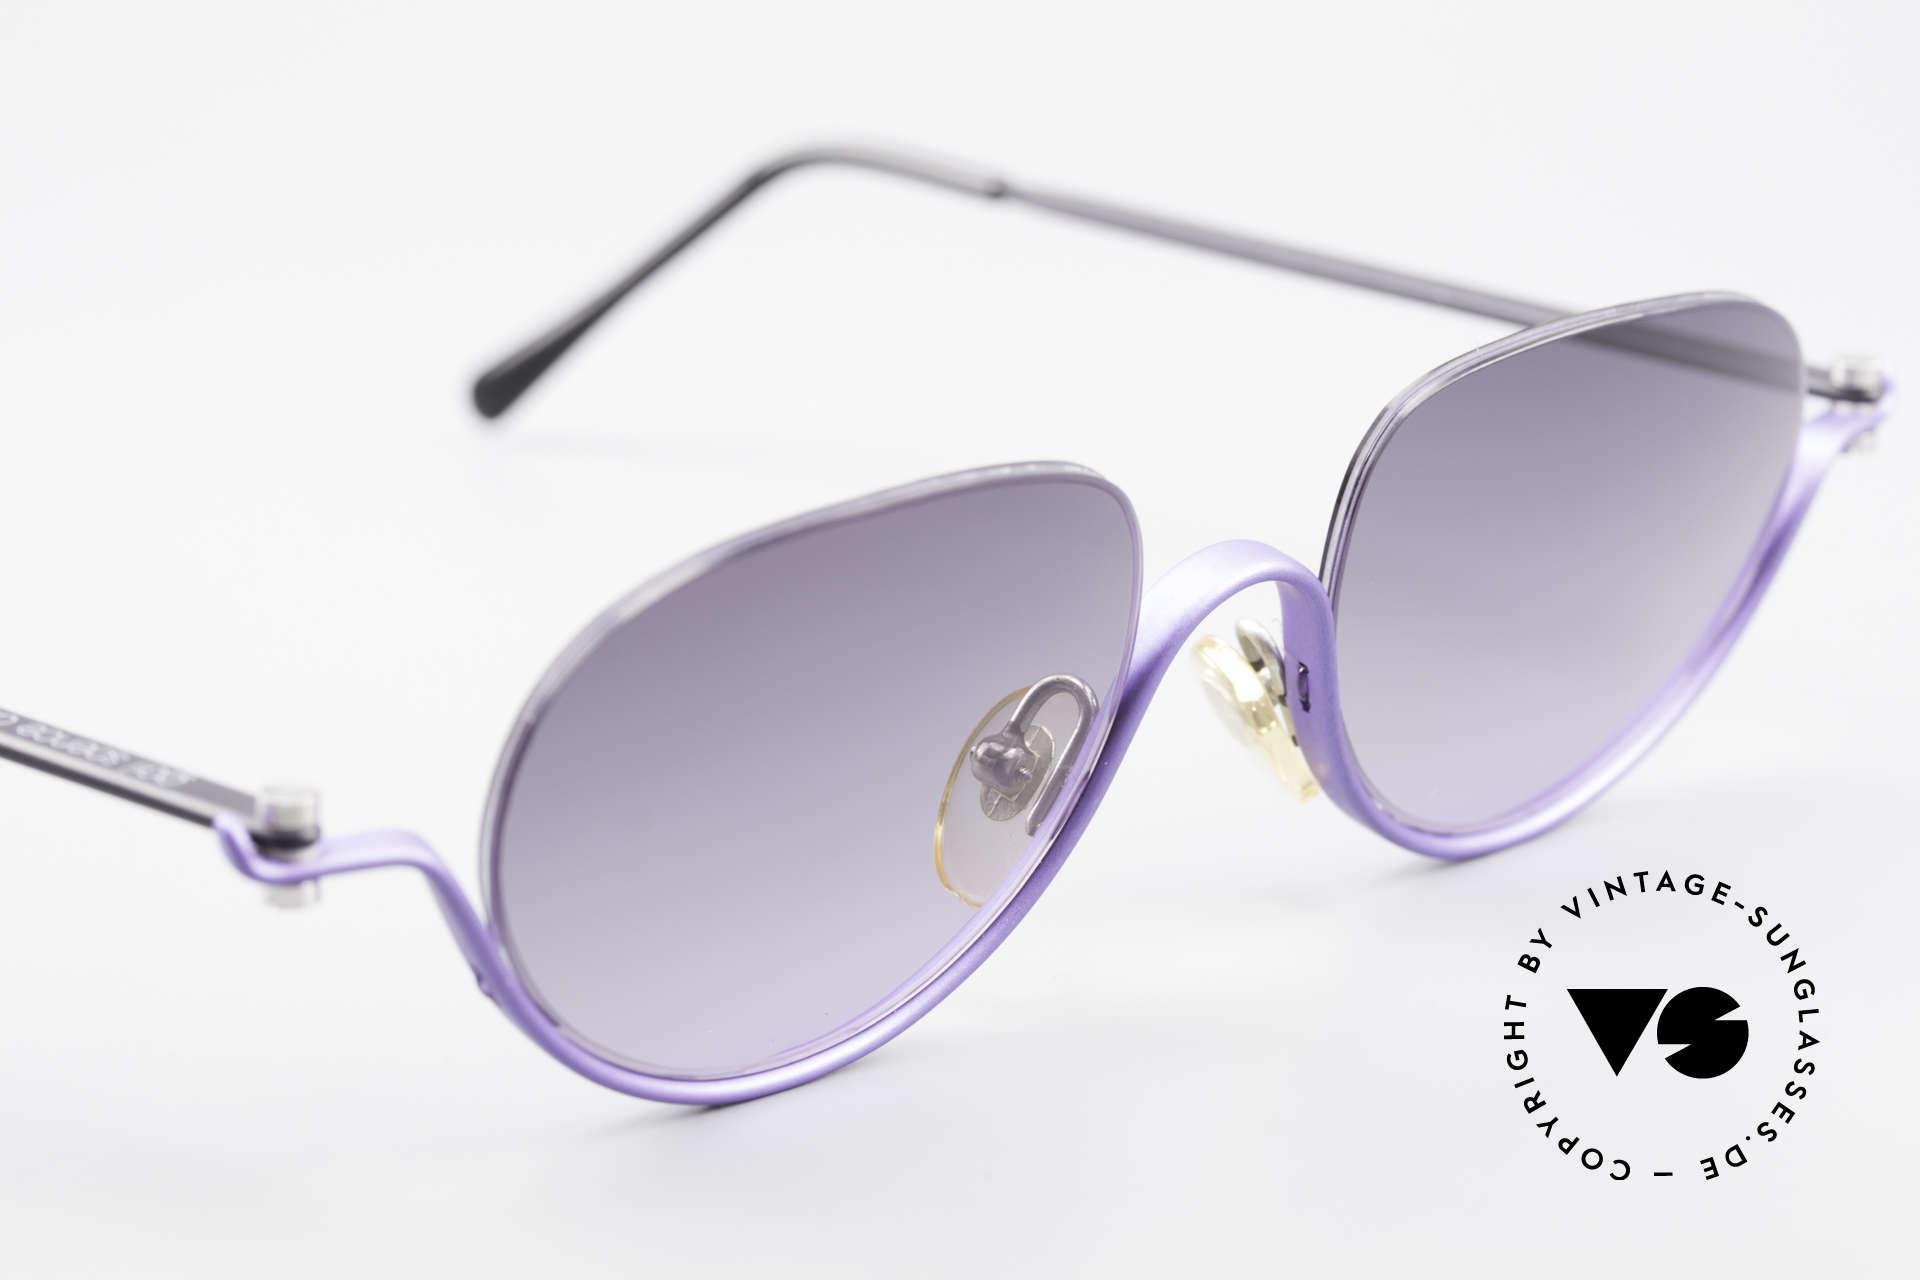 ProDesign No8 Gail Spence Design Sunglasses, ultra RARE designer sunglasses from the mid 1990's, Made for Women